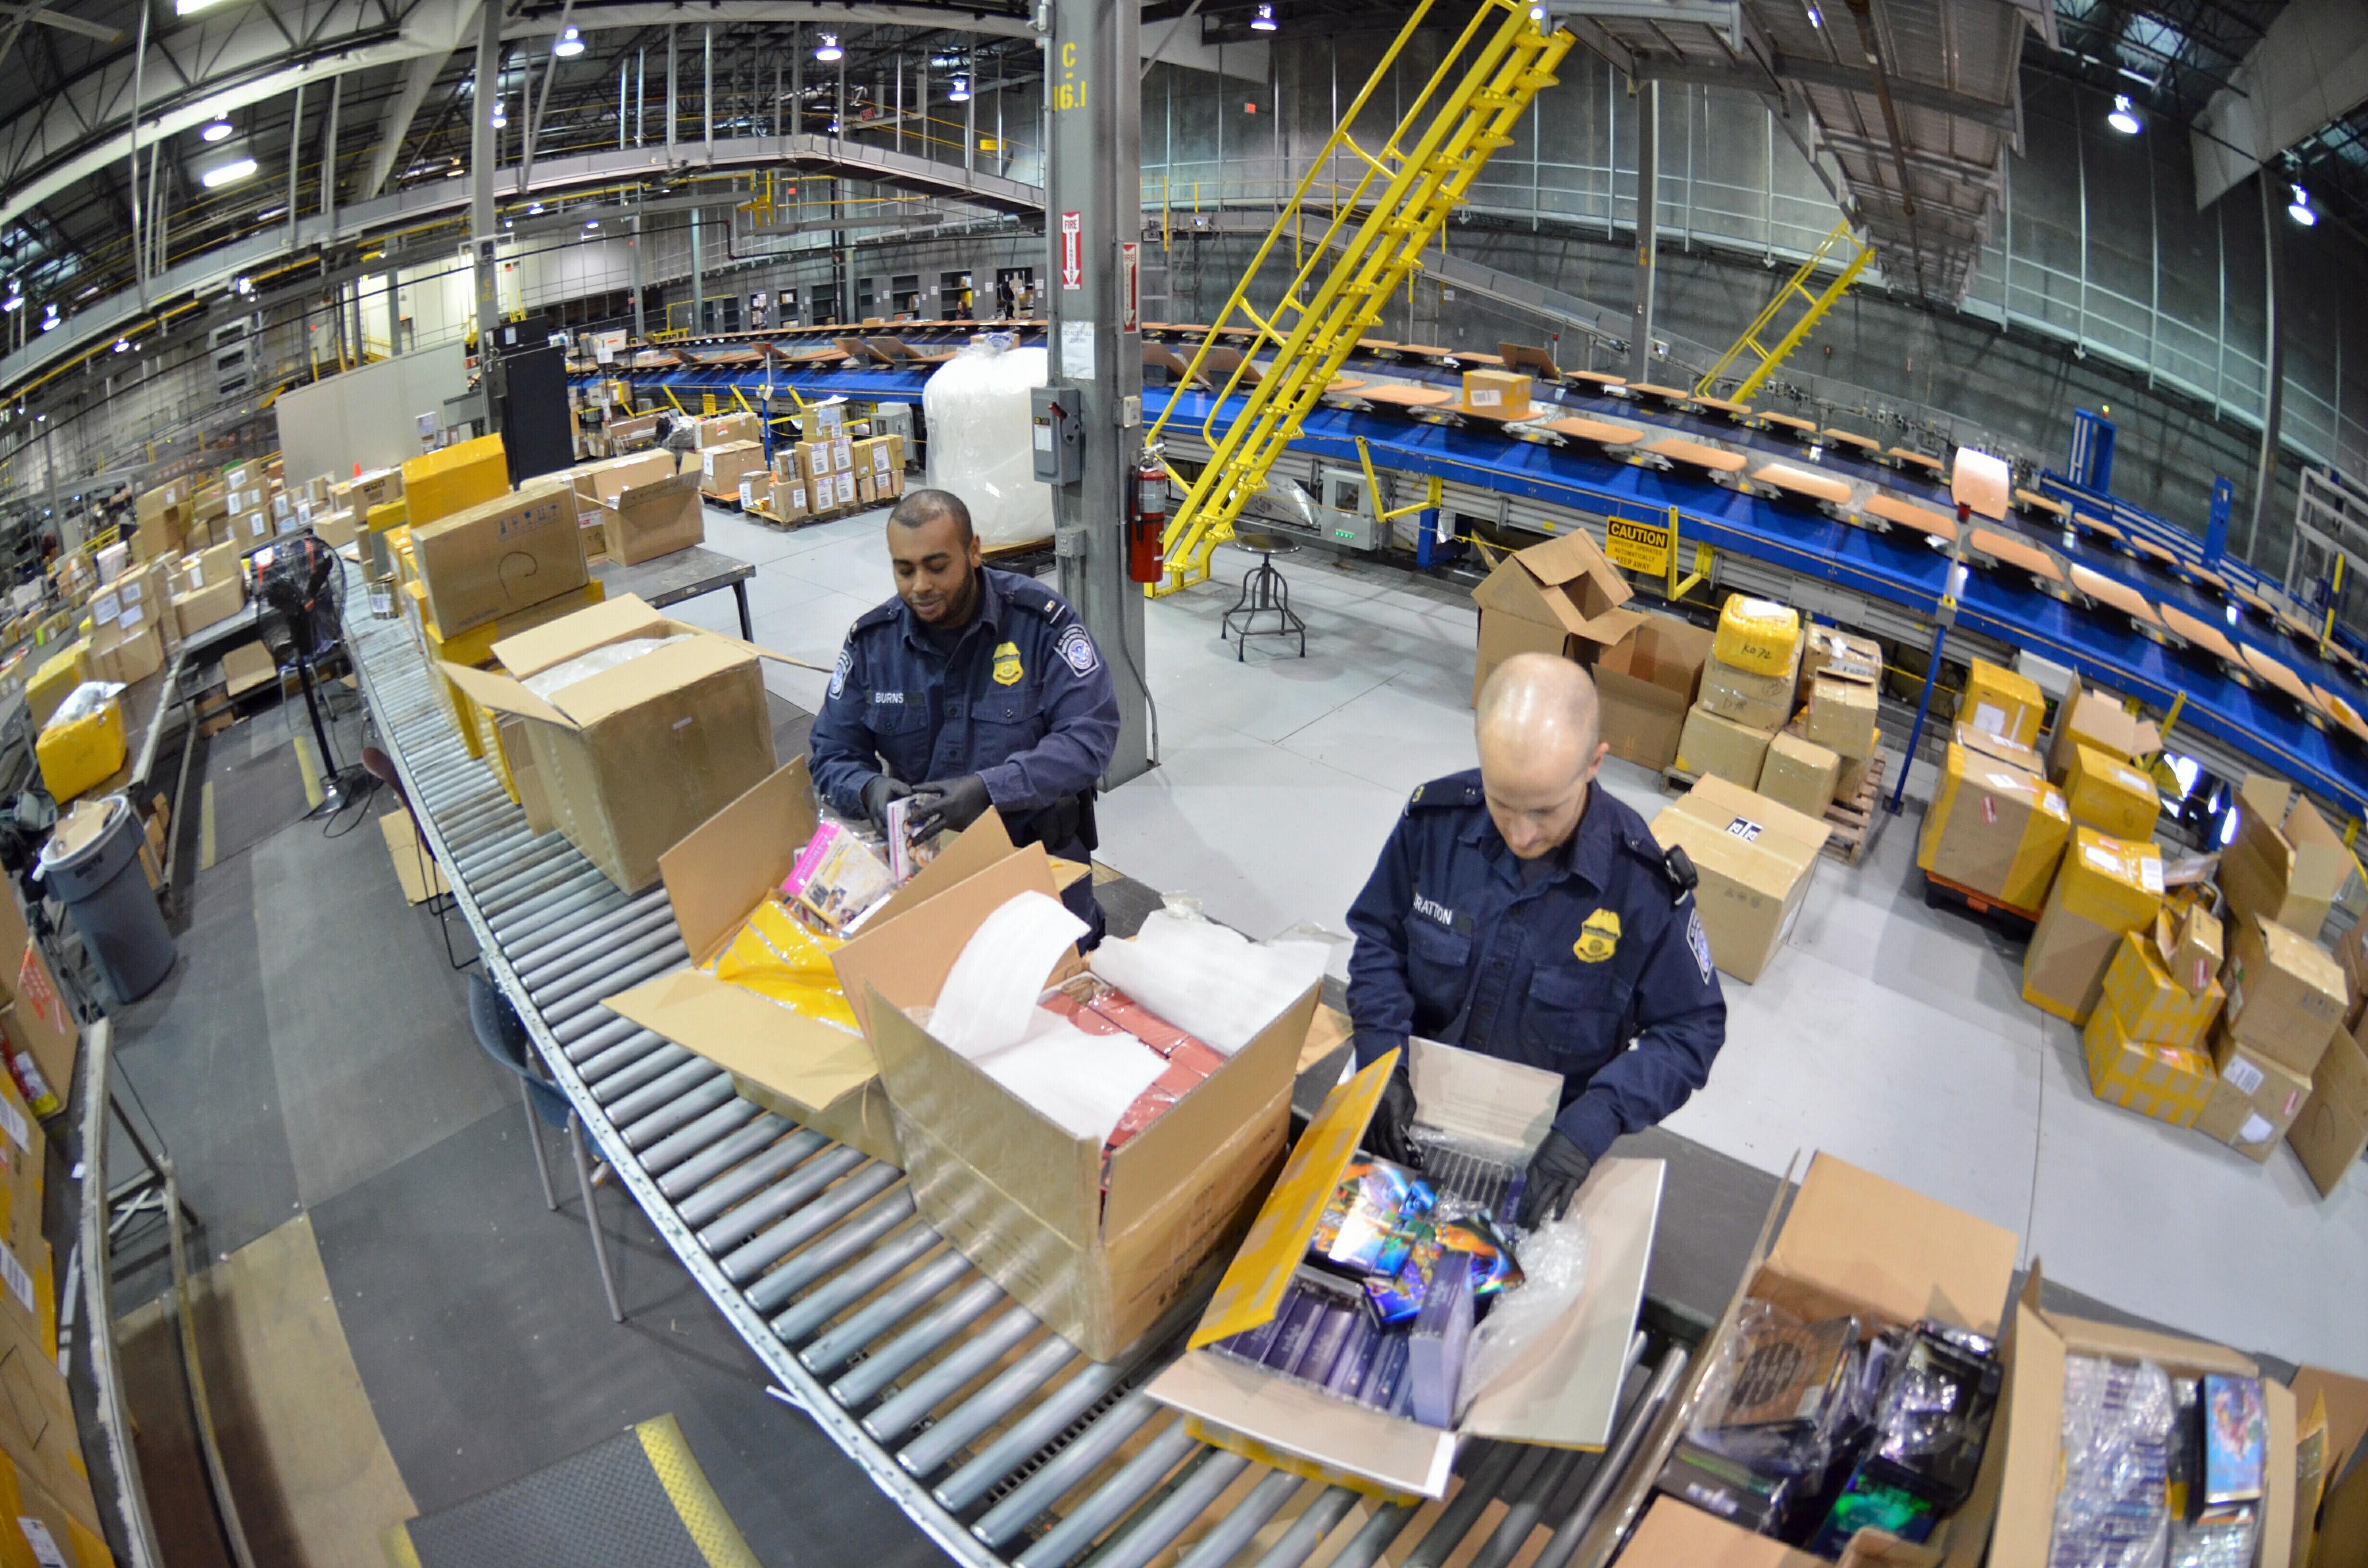 Cincinnati DHL 1 | U S  Customs and Border Protection